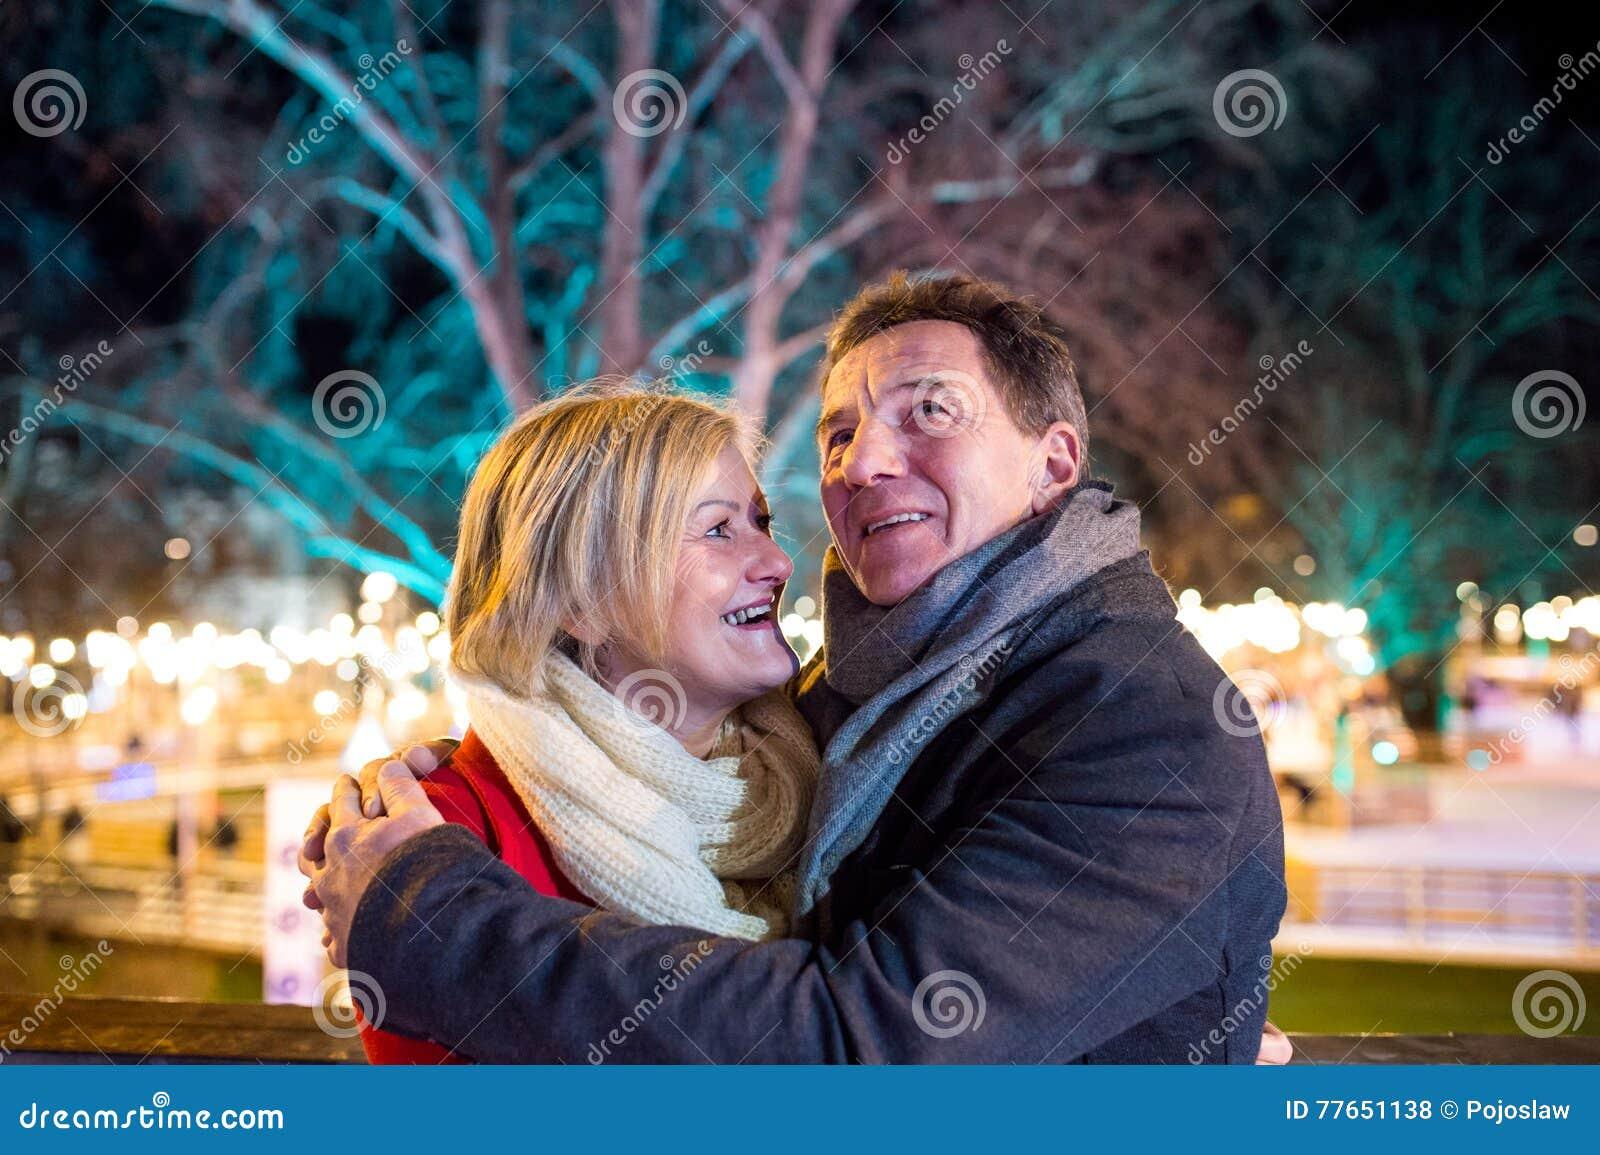 Senior couple walking in night city. Winter, Historical building